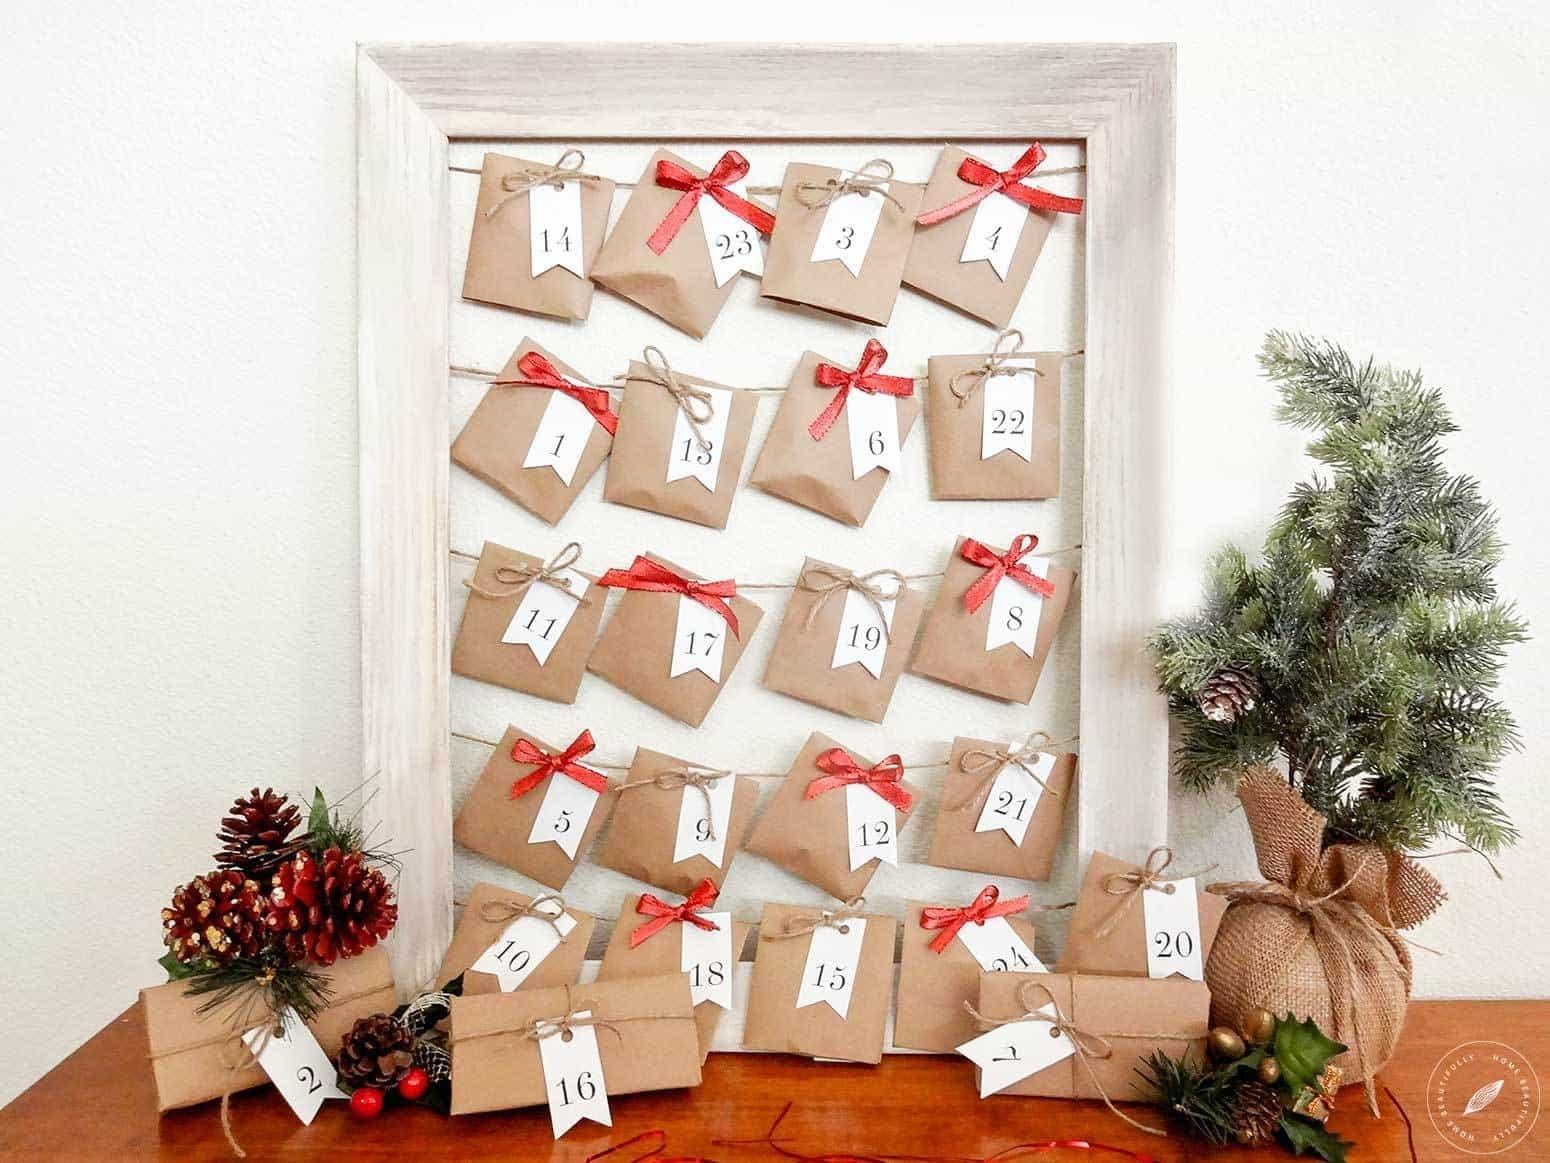 How To Create A Easy, Fun Diy Advent Calendar for Create An Advent Calender Wooden